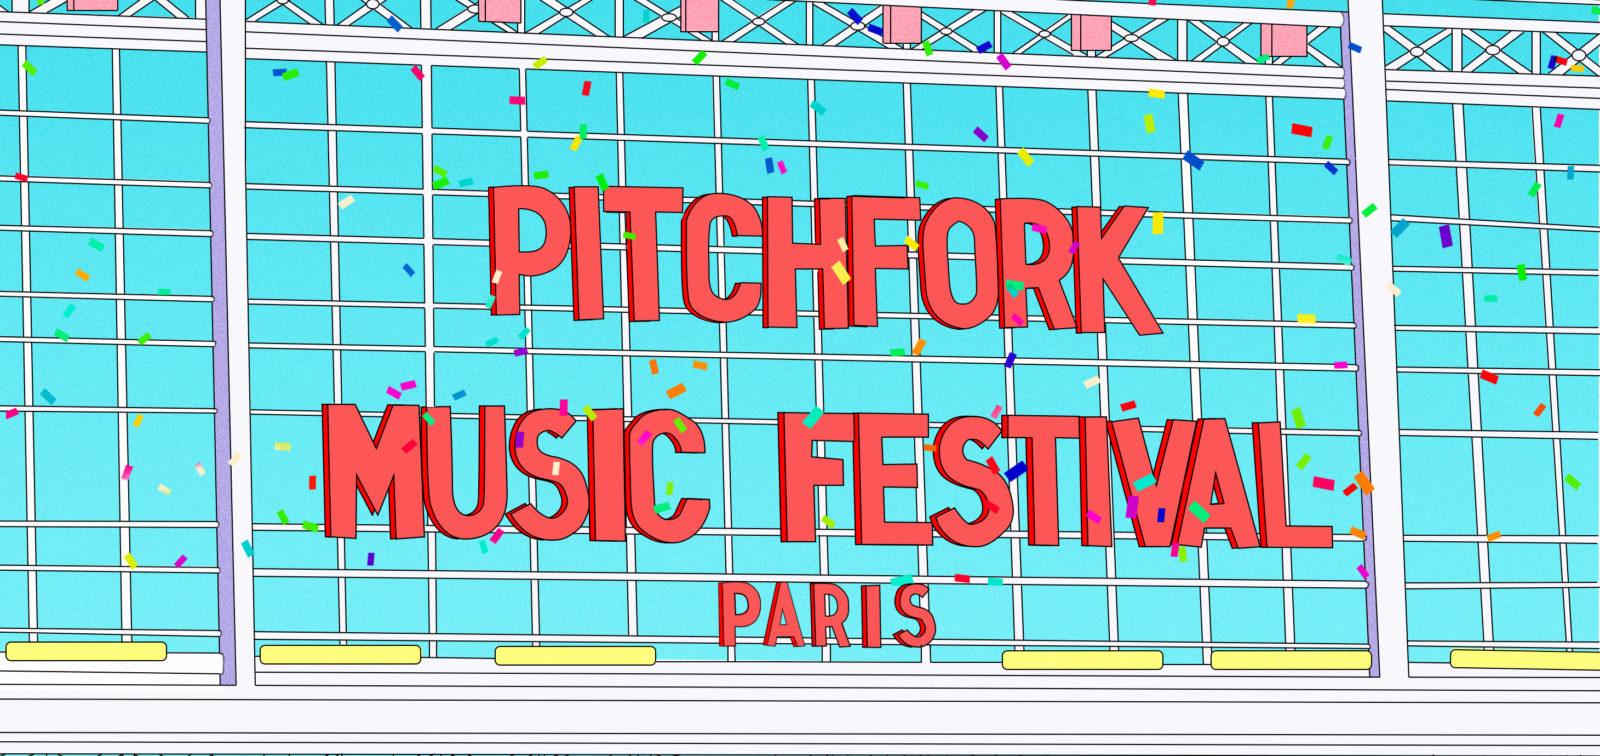 [Festival] Pitchfork Music Festival Paris